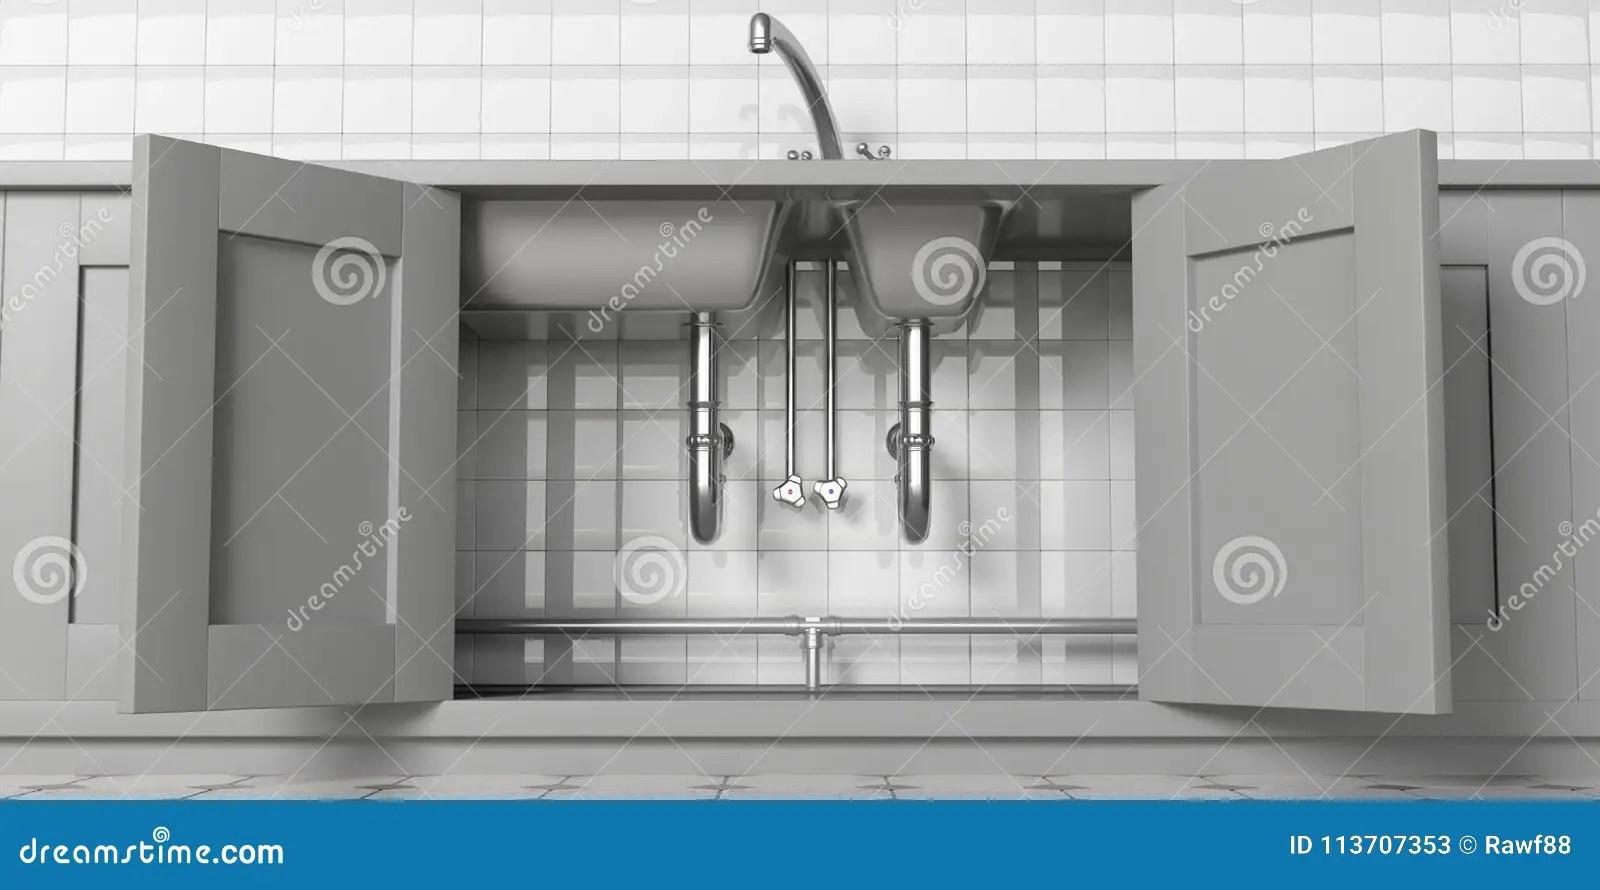 sink kitchen cabinets martha stewart 有开门 不锈钢水槽和水龙头的厨柜 在看法下白色铺磁砖的墙壁backgound 在看法下白色铺